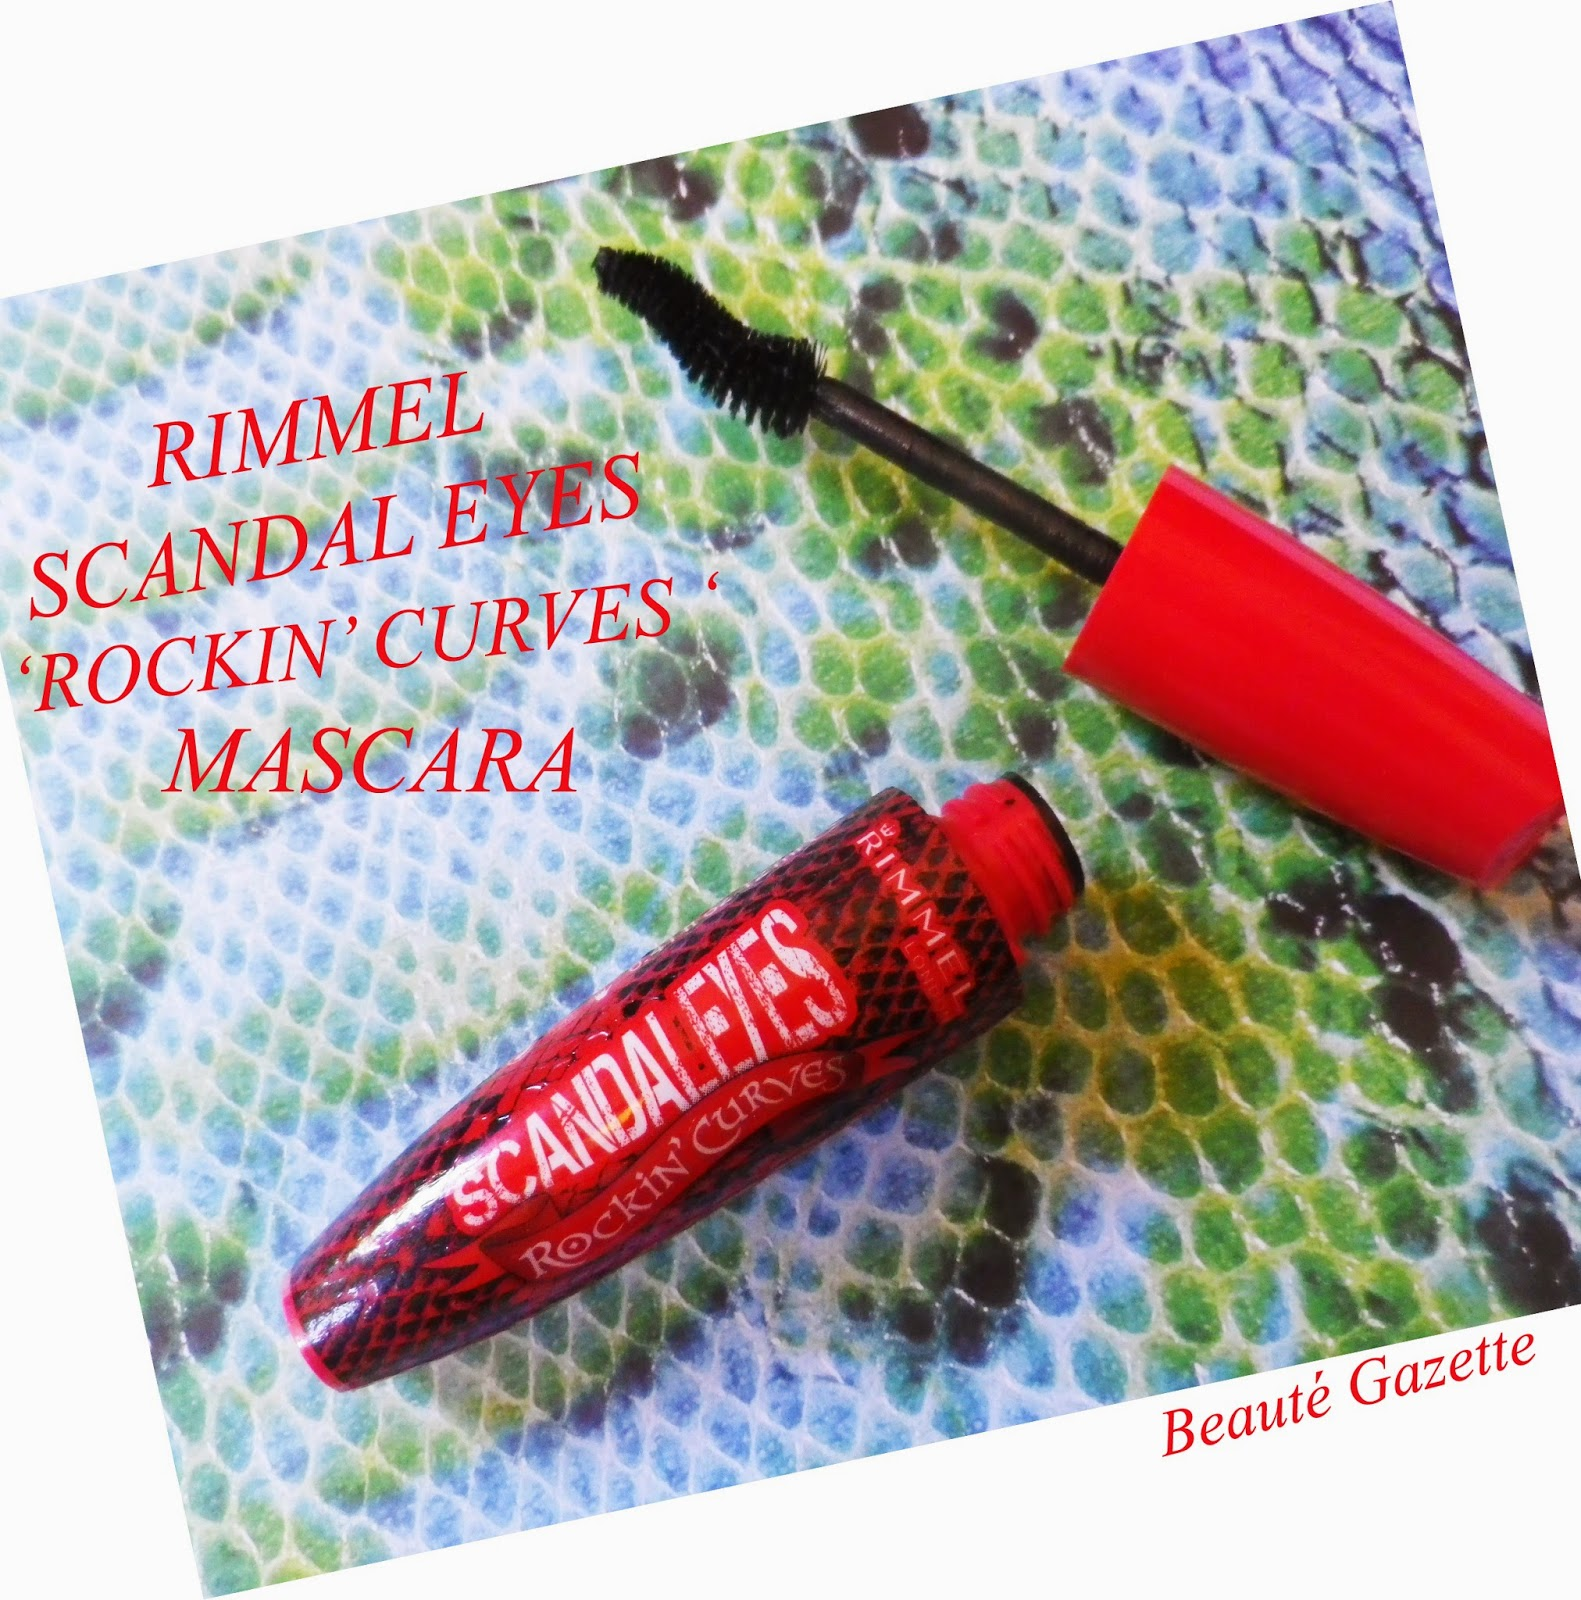 ce95eaa4ebb Beauté Gazette: RImmel Scandal Eyes 'Rockin' Curves' Mascara + Kate ...